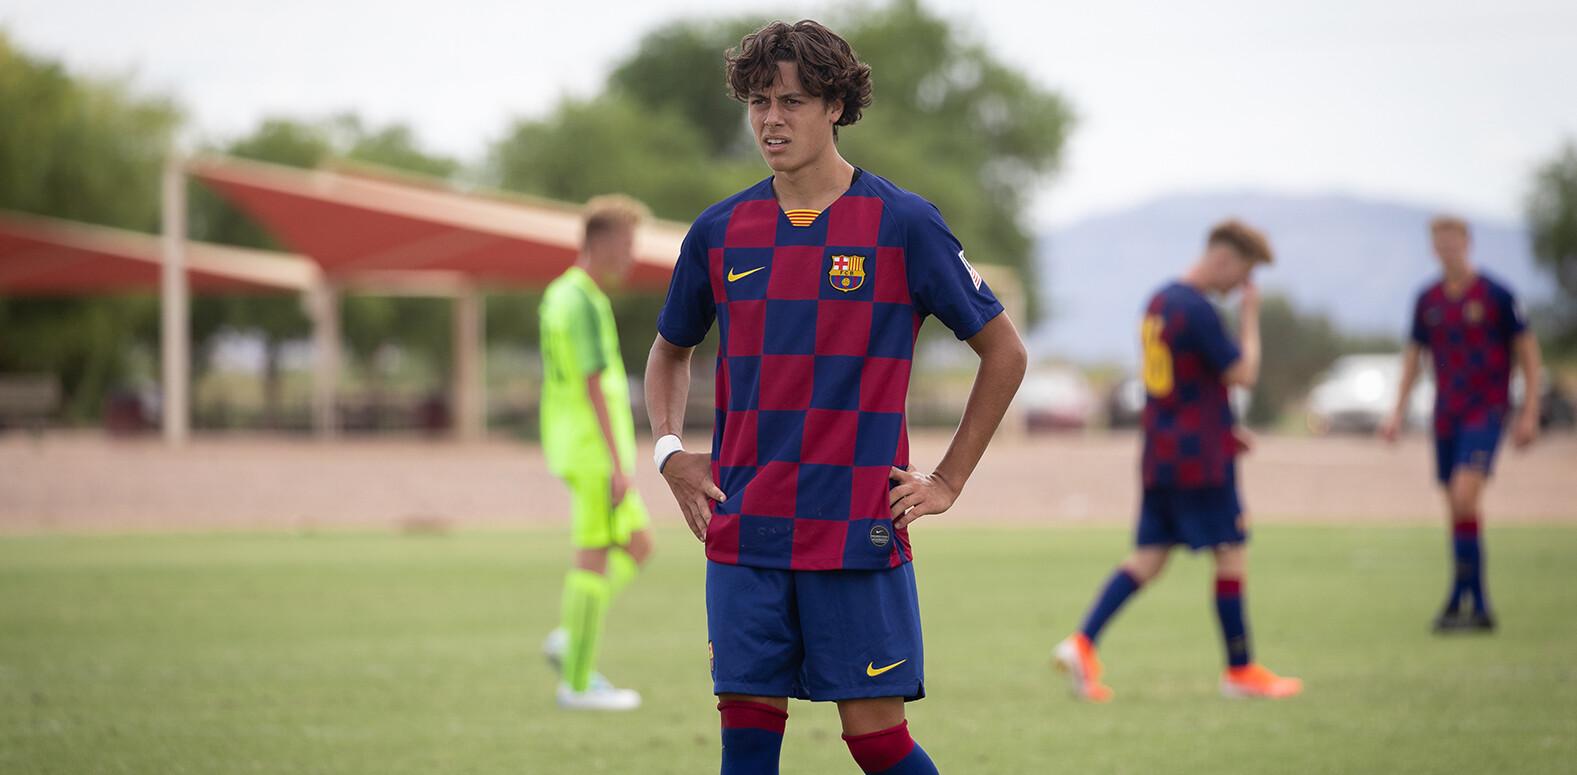 Caden Clark - Barca Residency Academy U-19 midfielder